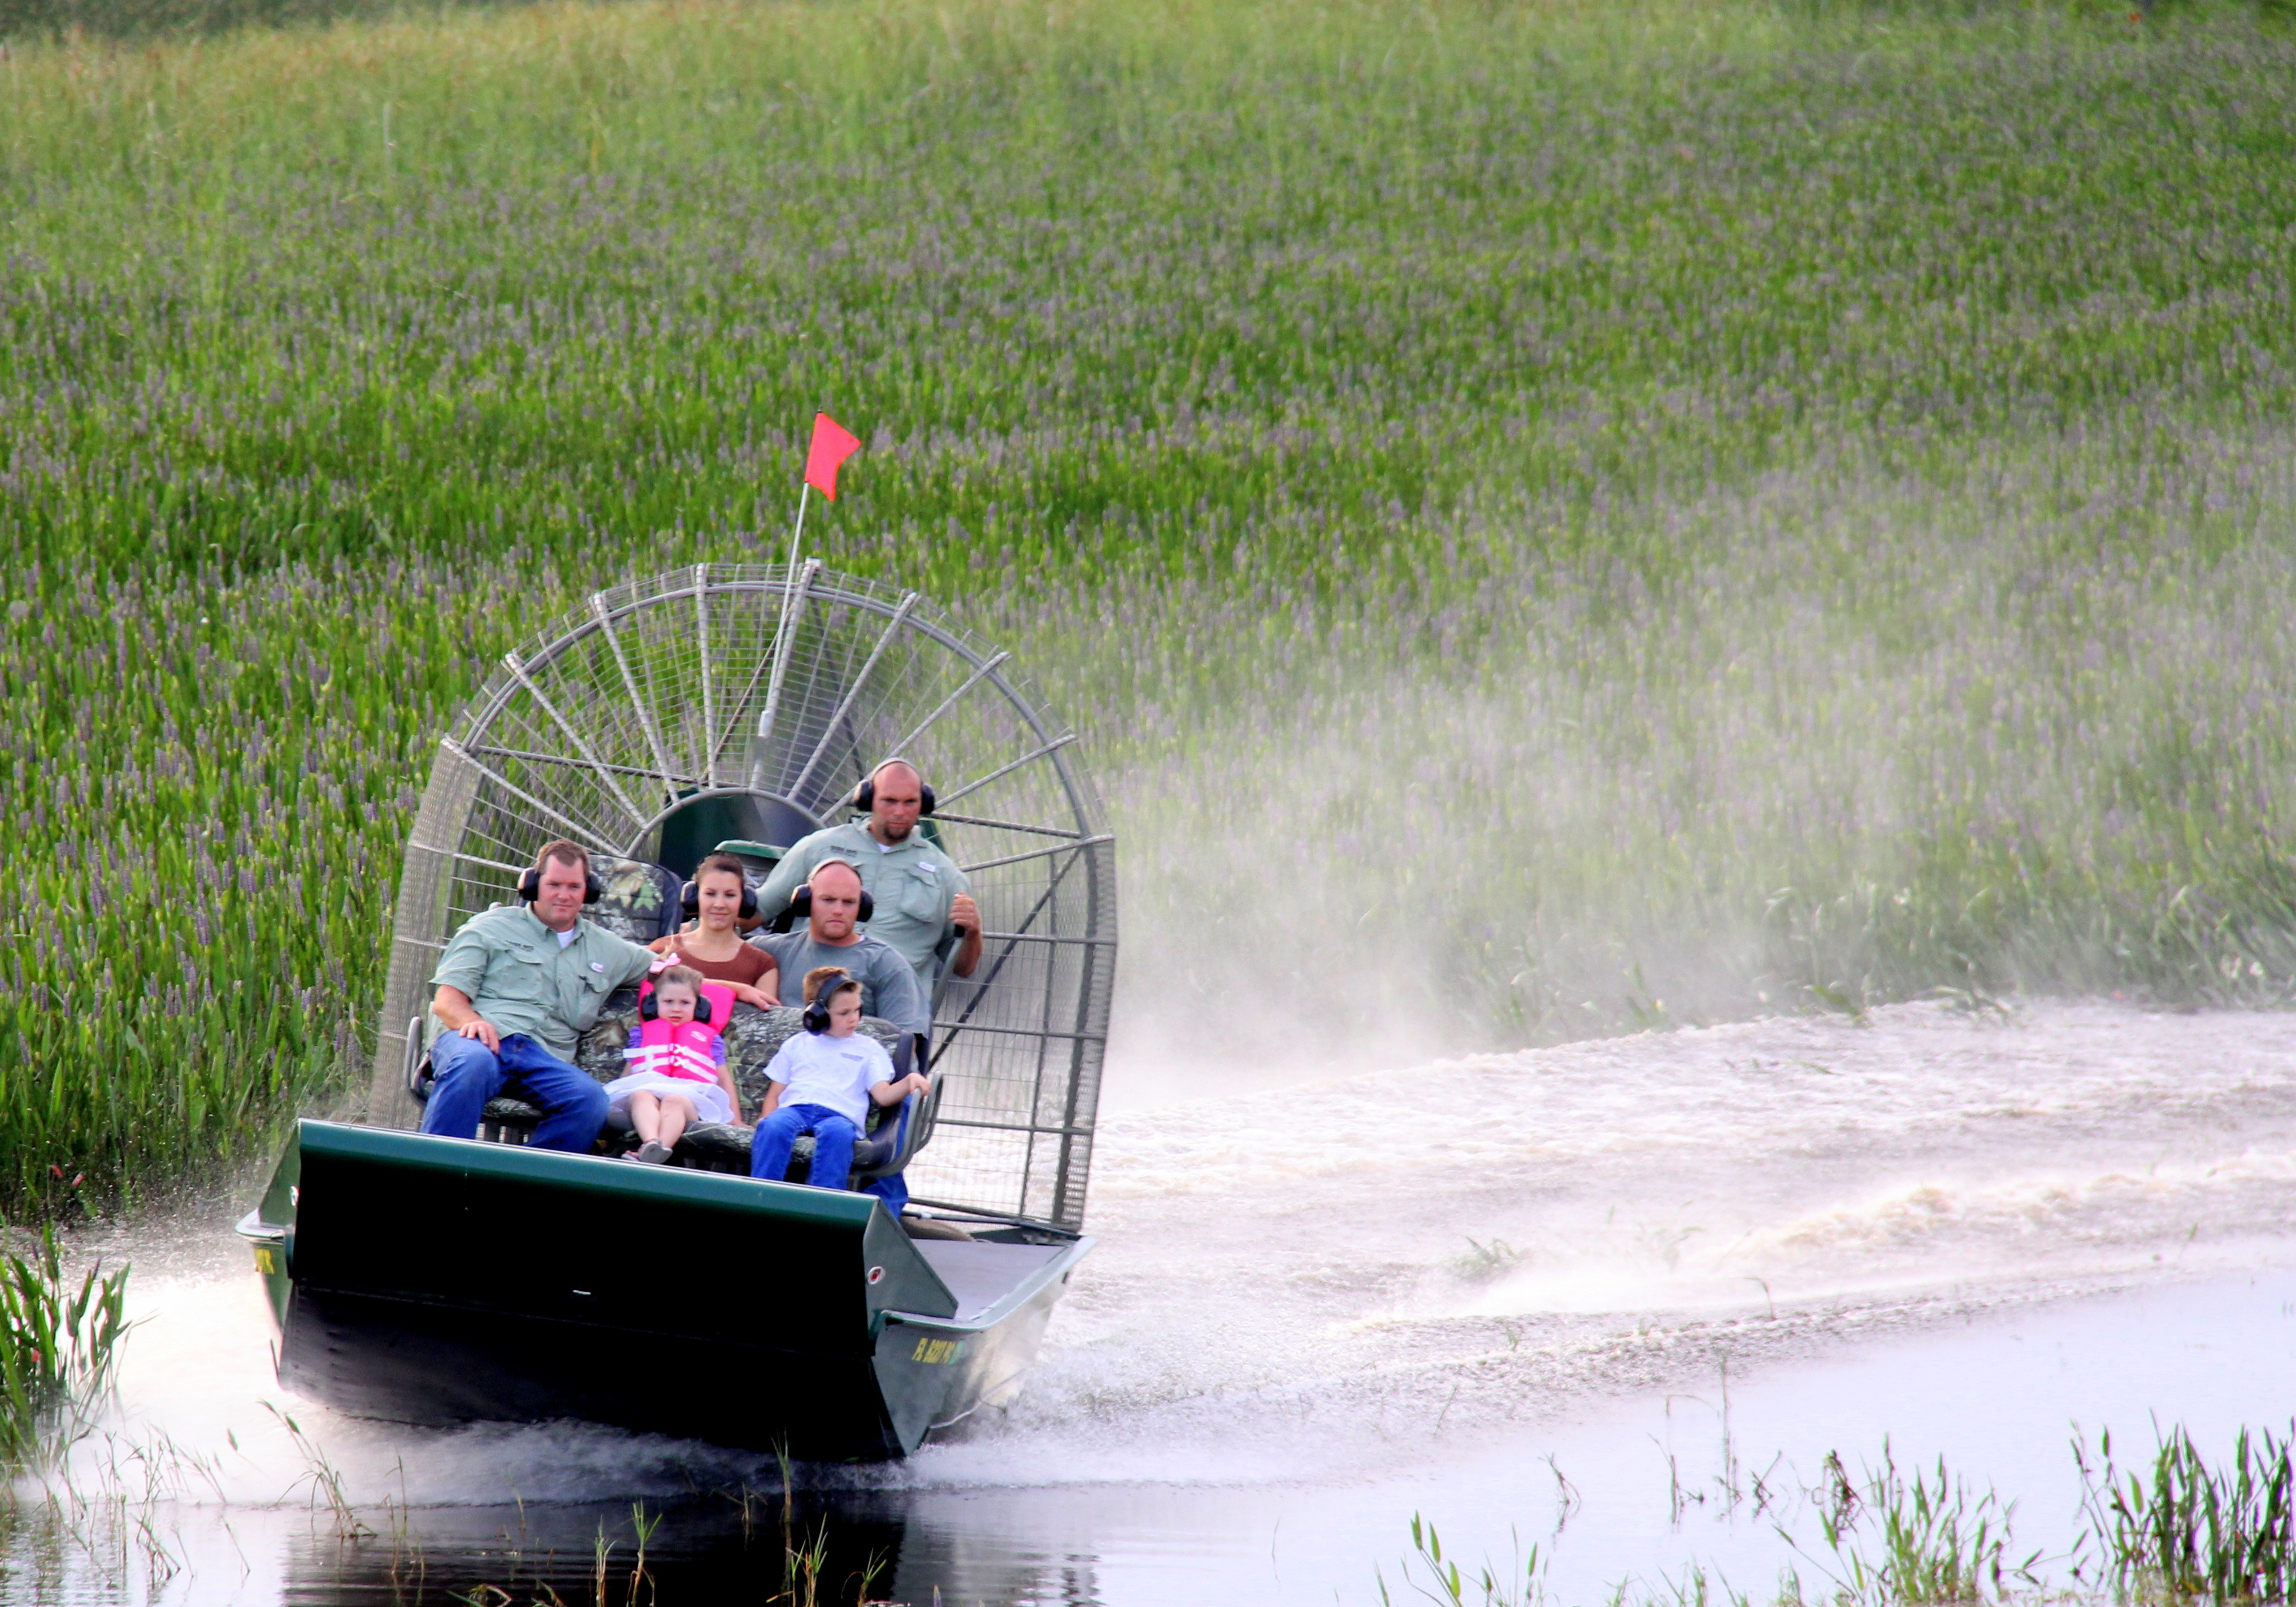 Wild_Florida_airboat-1.jpg